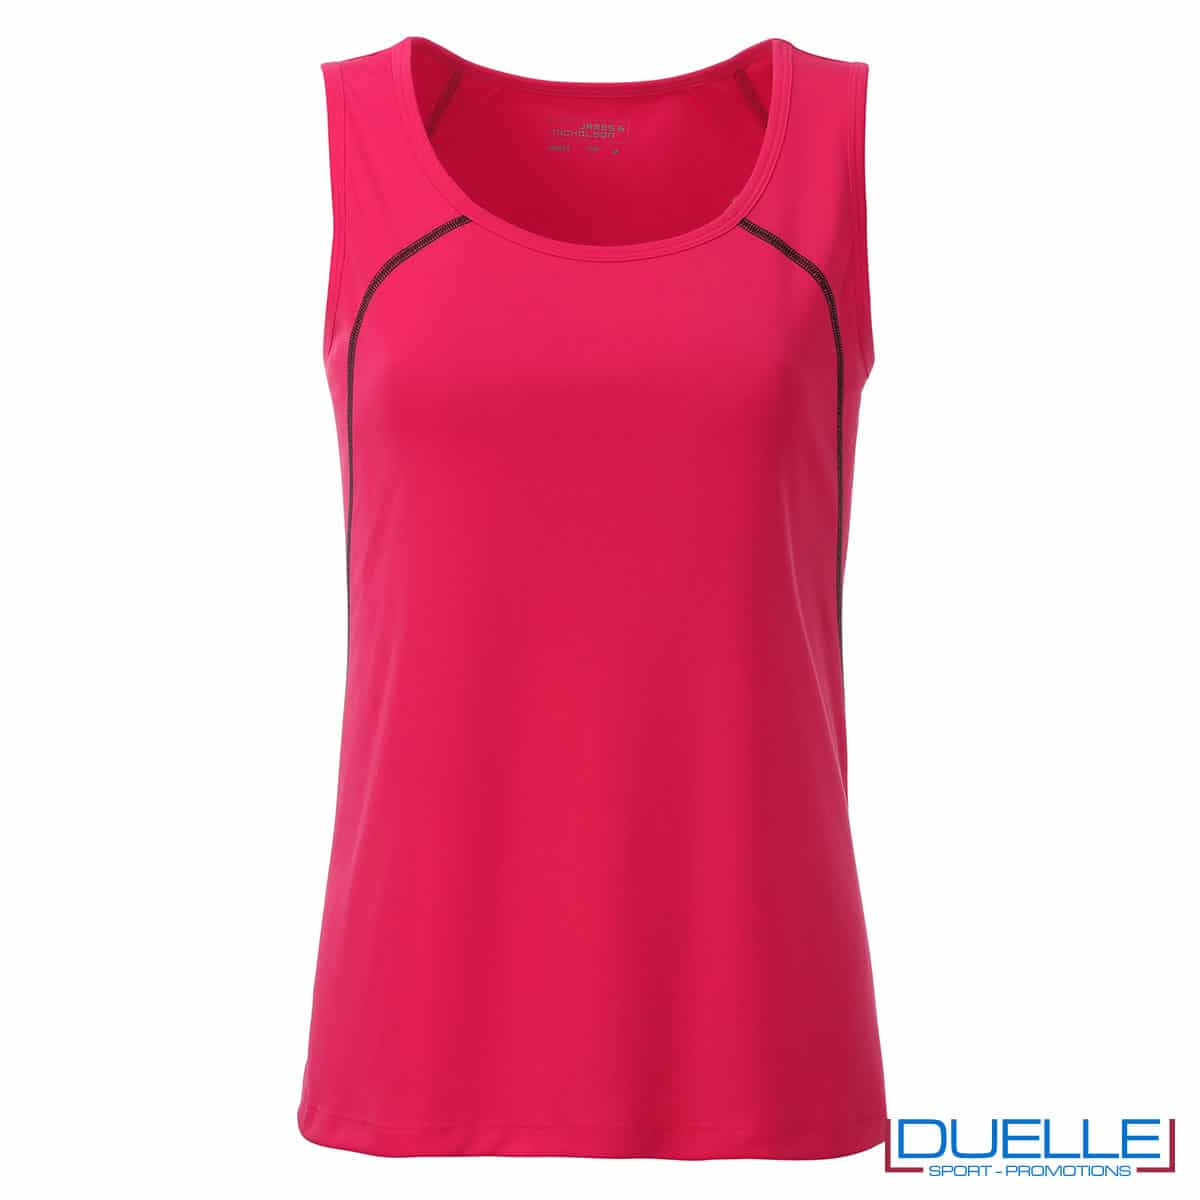 Canotta rosa fluo atletica femminile